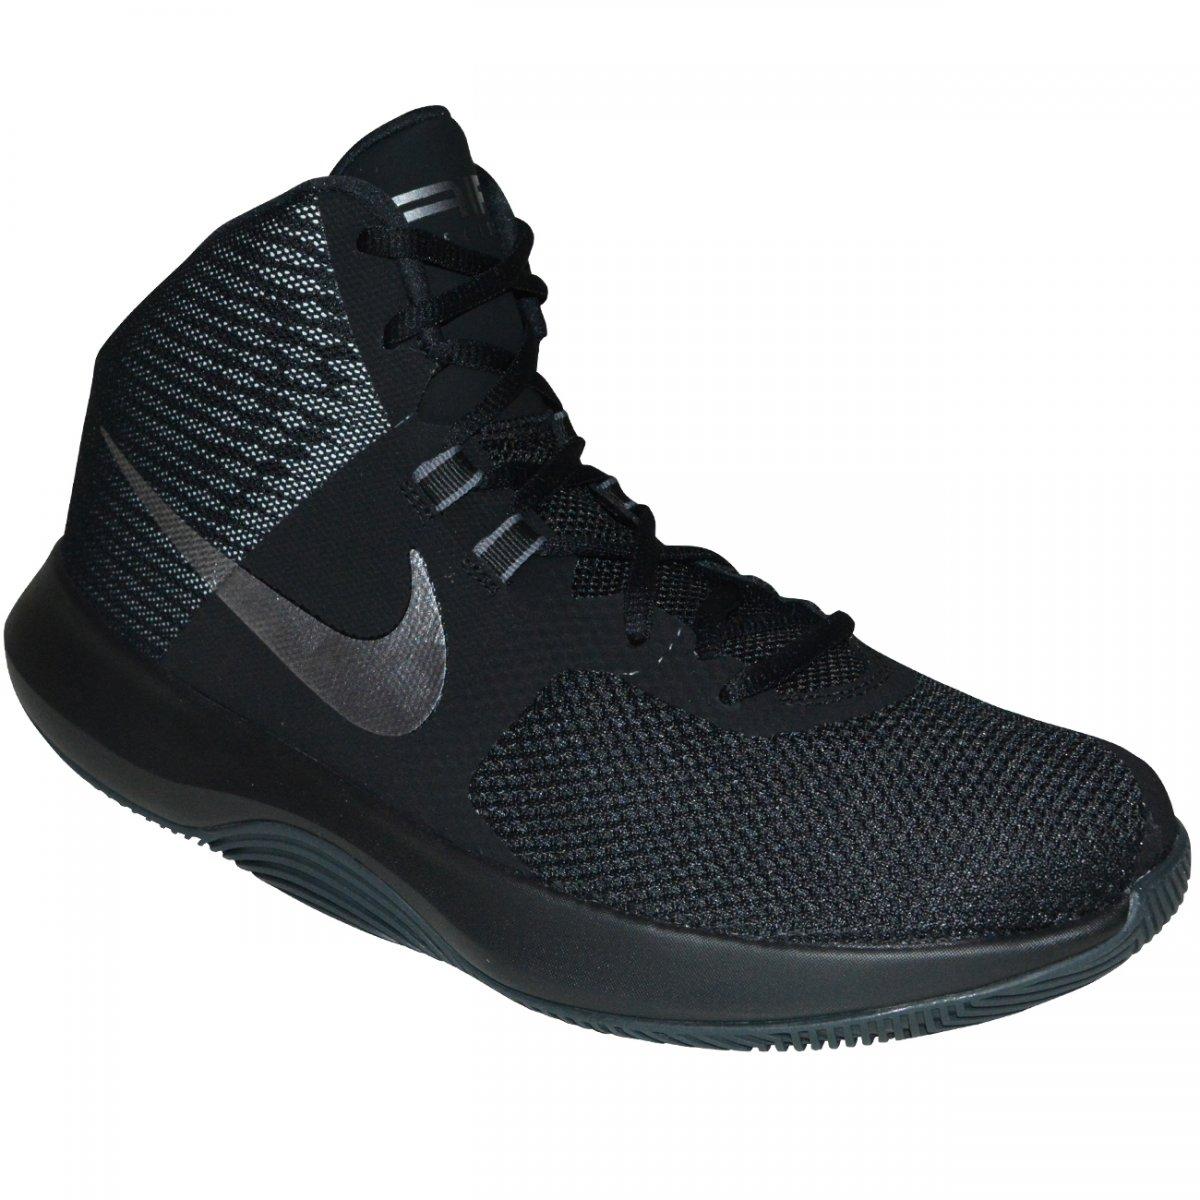 3c23f09a3cb Tenis Nike Air Precision NBK 898452 001 - Preto prata - Chuteira Nike